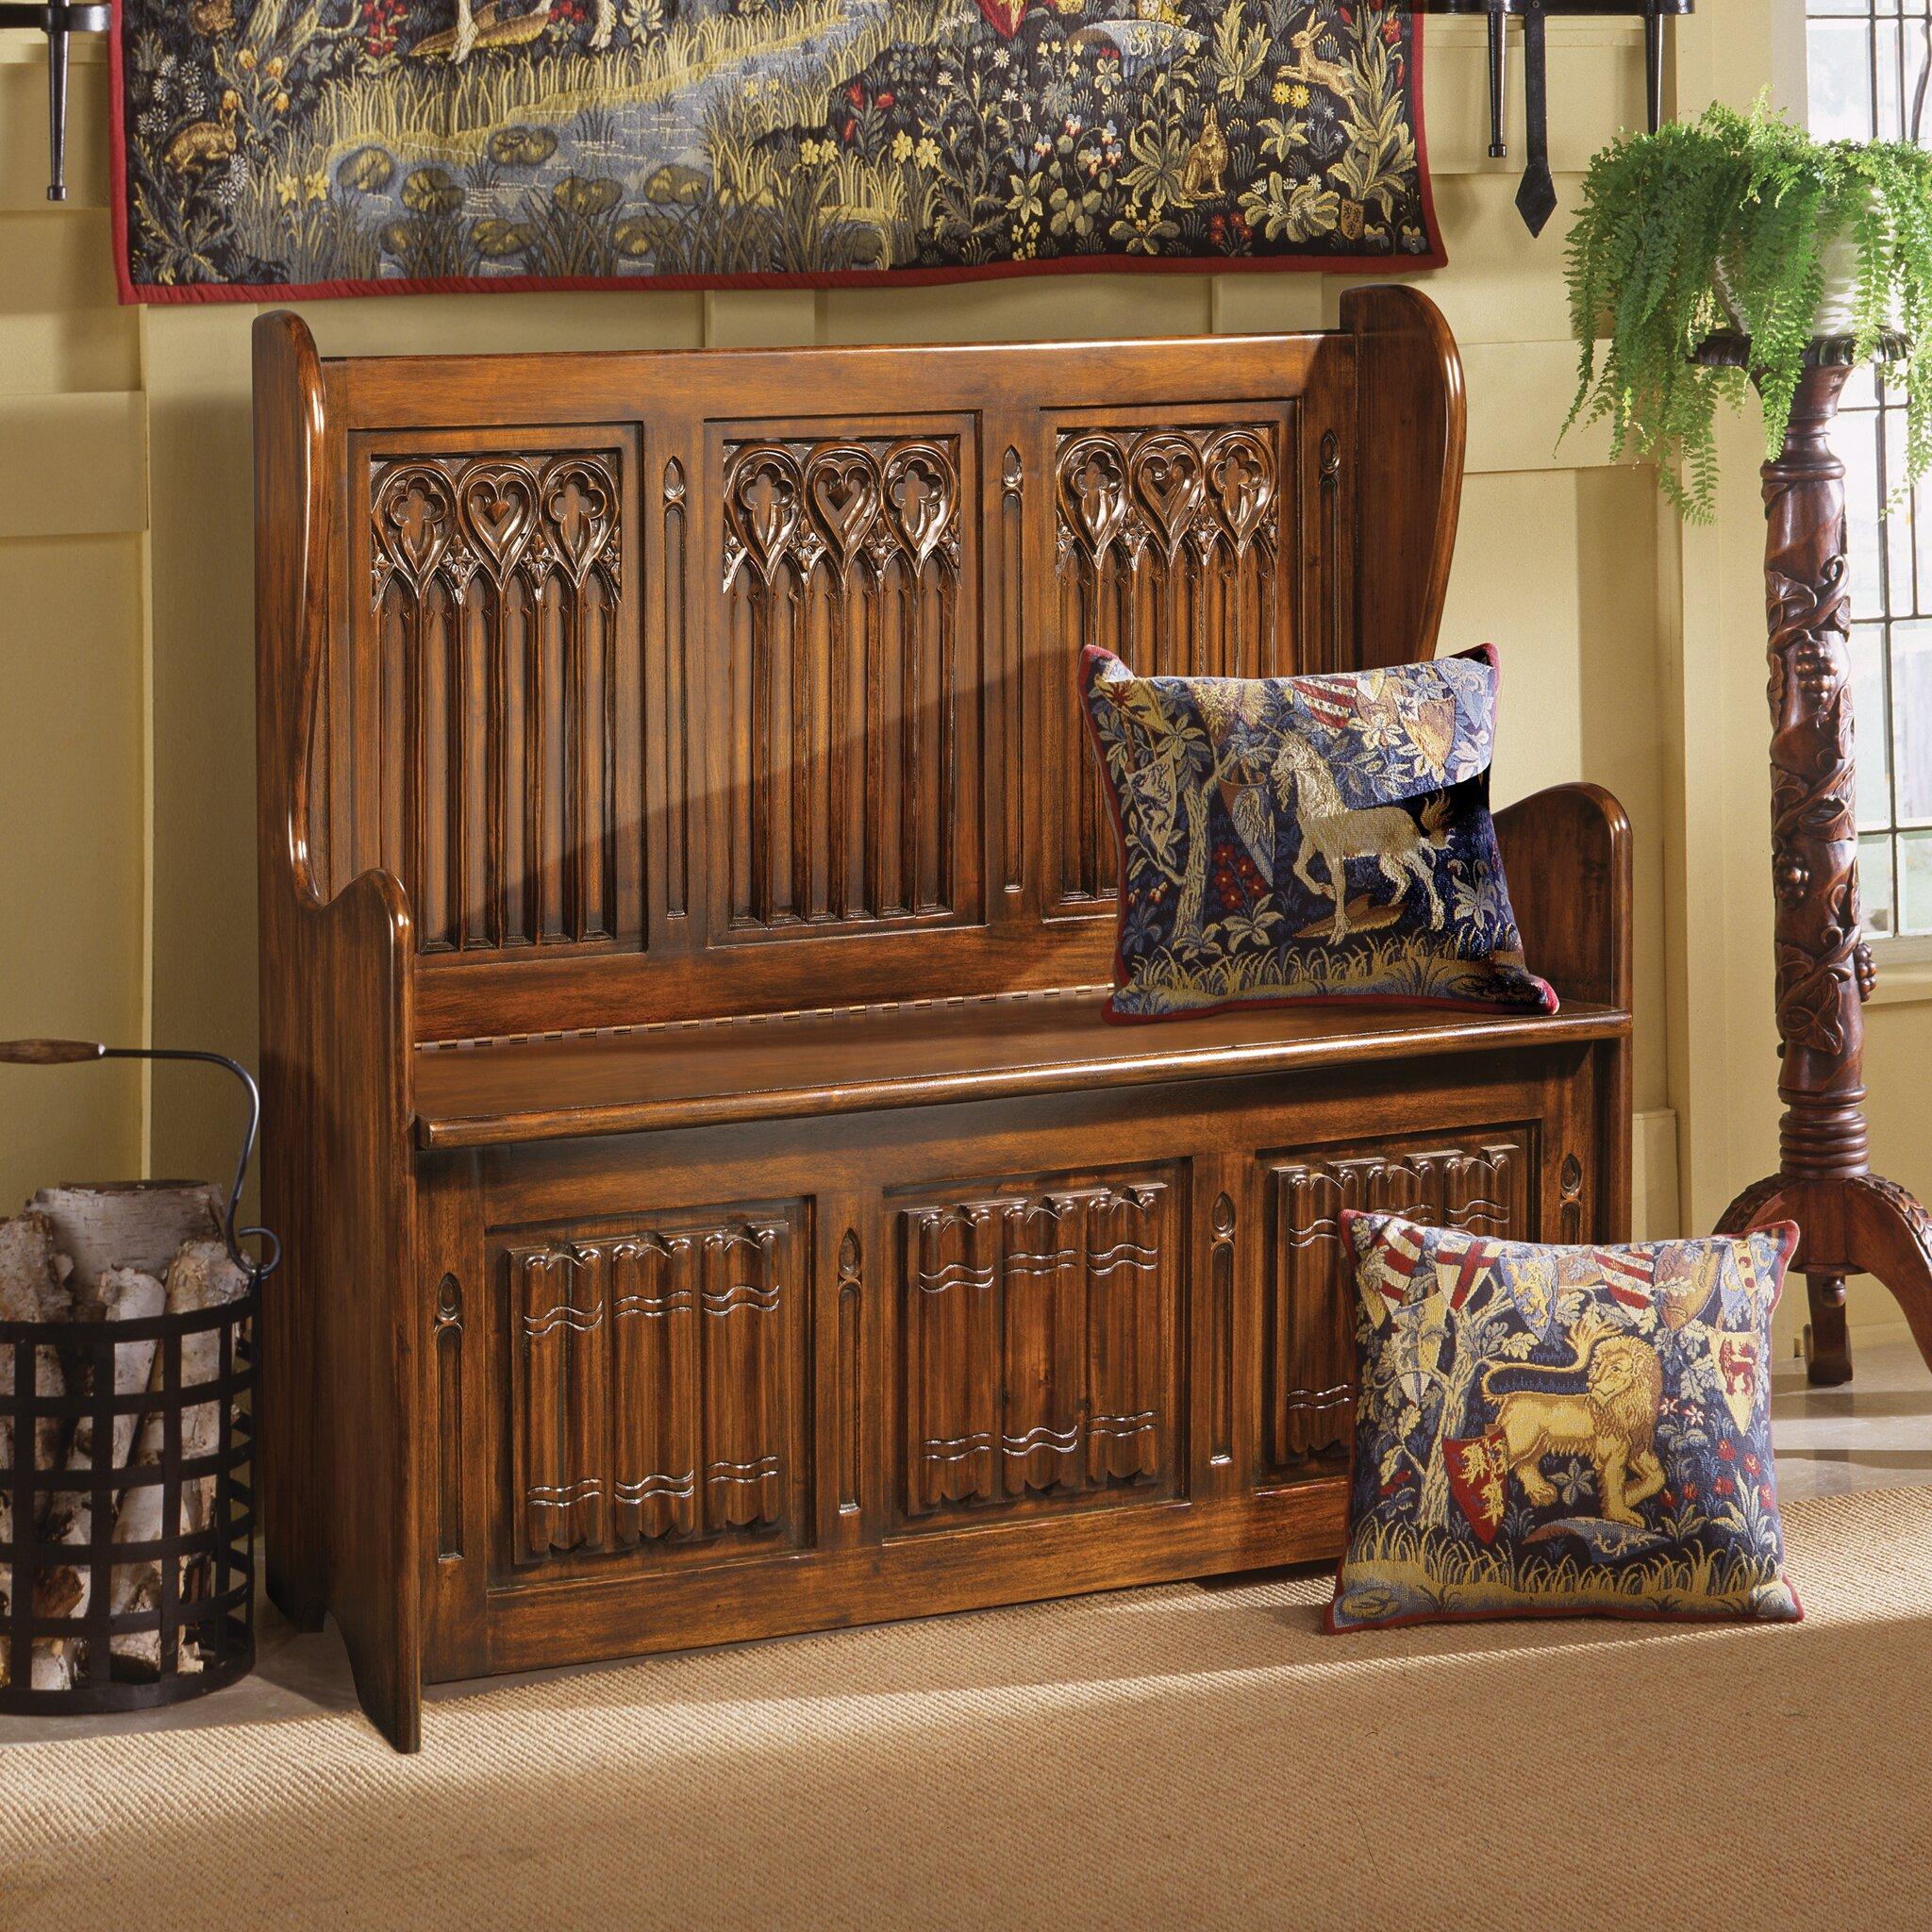 Foyer Mudroom Reviews : Design toscano kylemore abbey gothic storage entryway